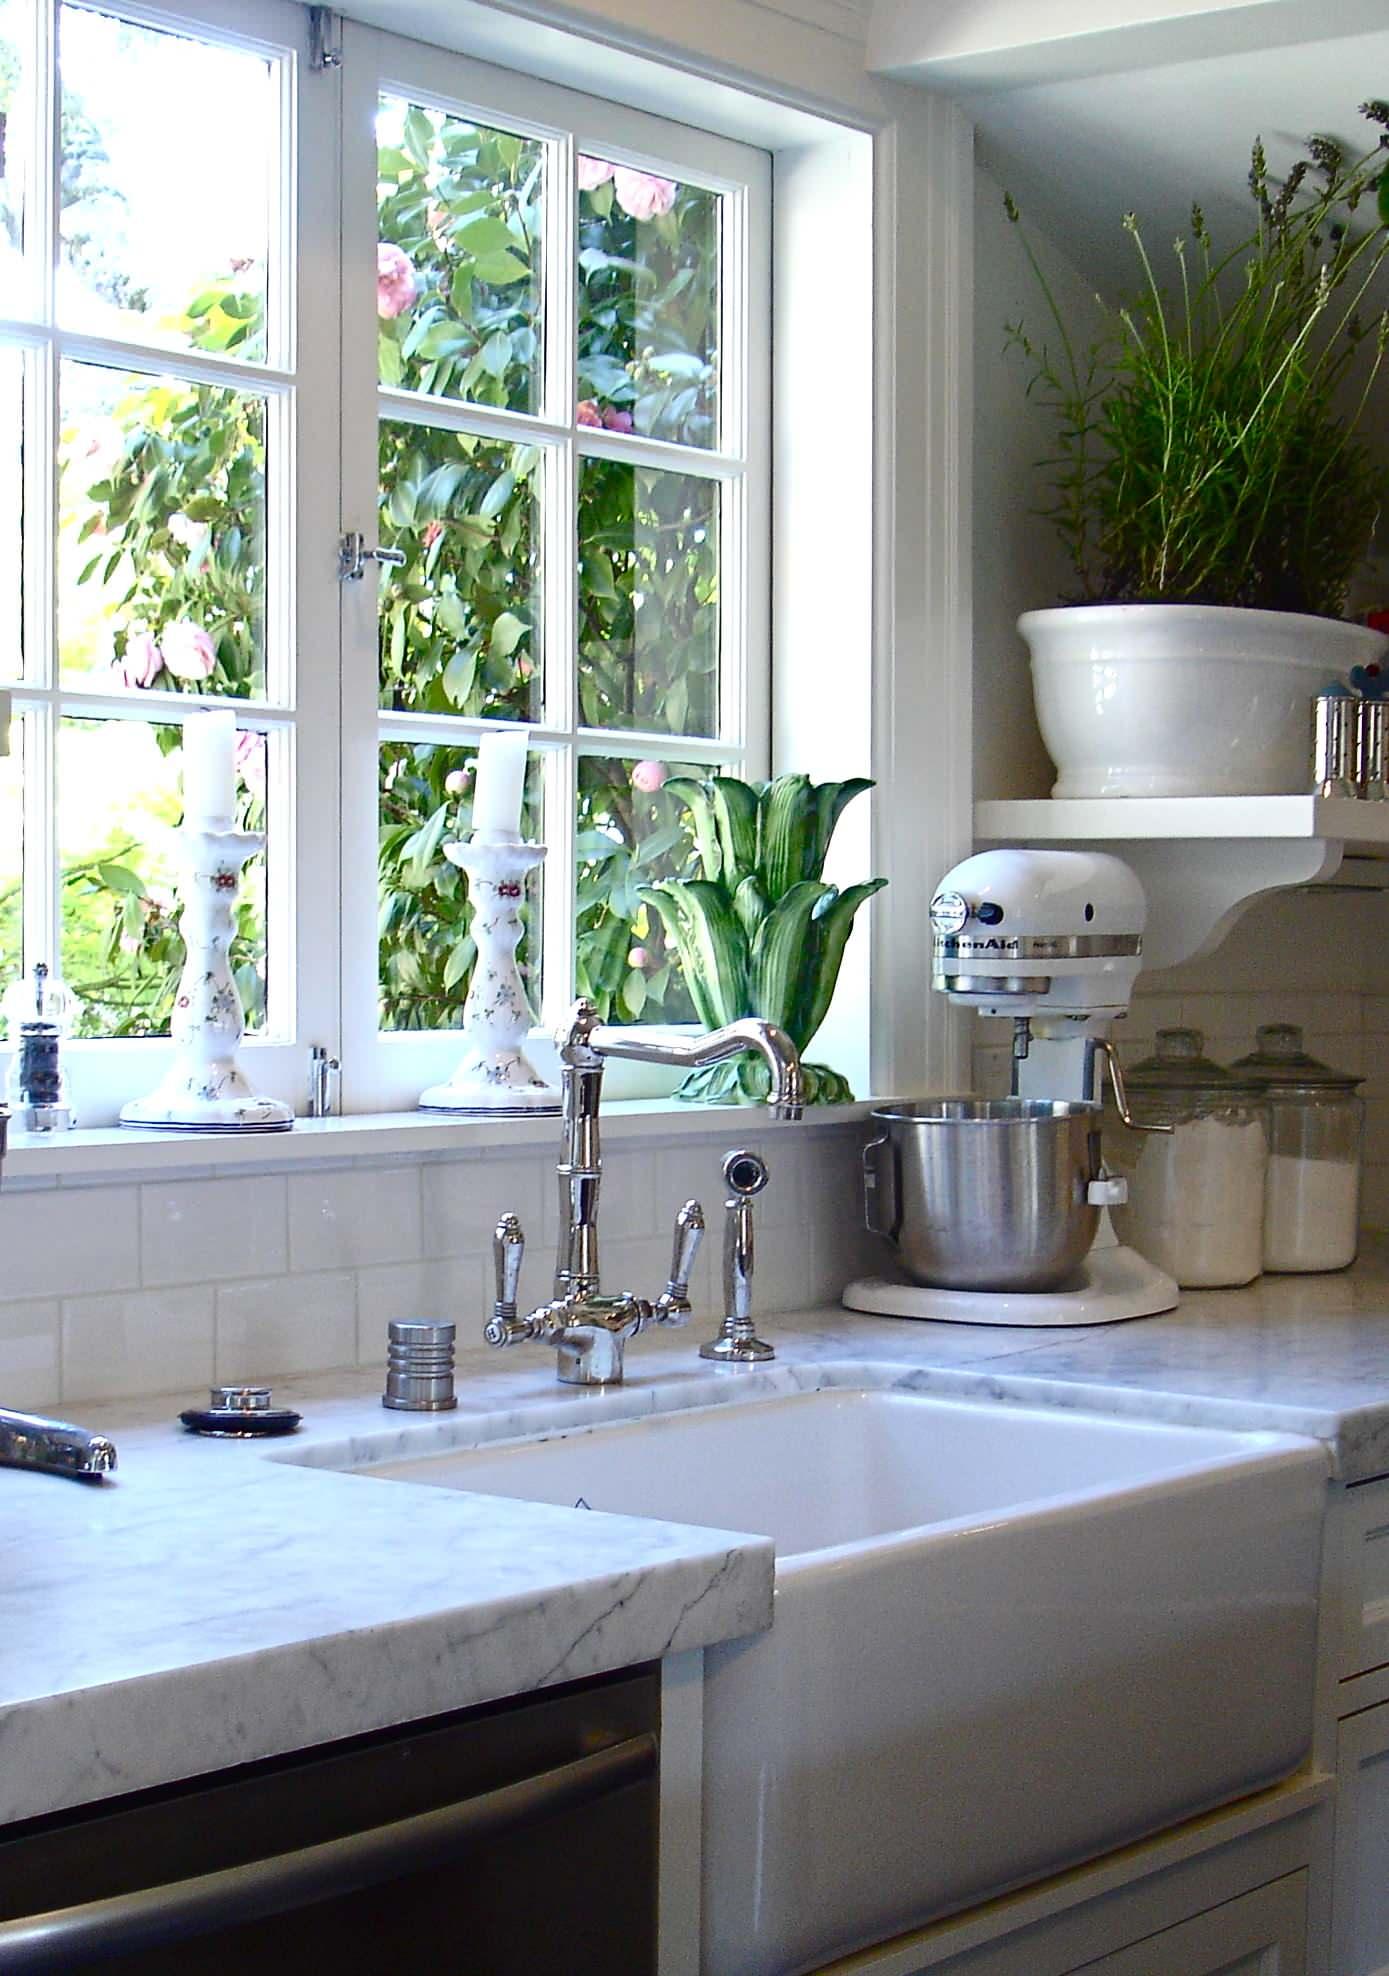 4 Gorgeous Kitchen Sink Ideas ... on Kitchen Sink Ideas  id=90327